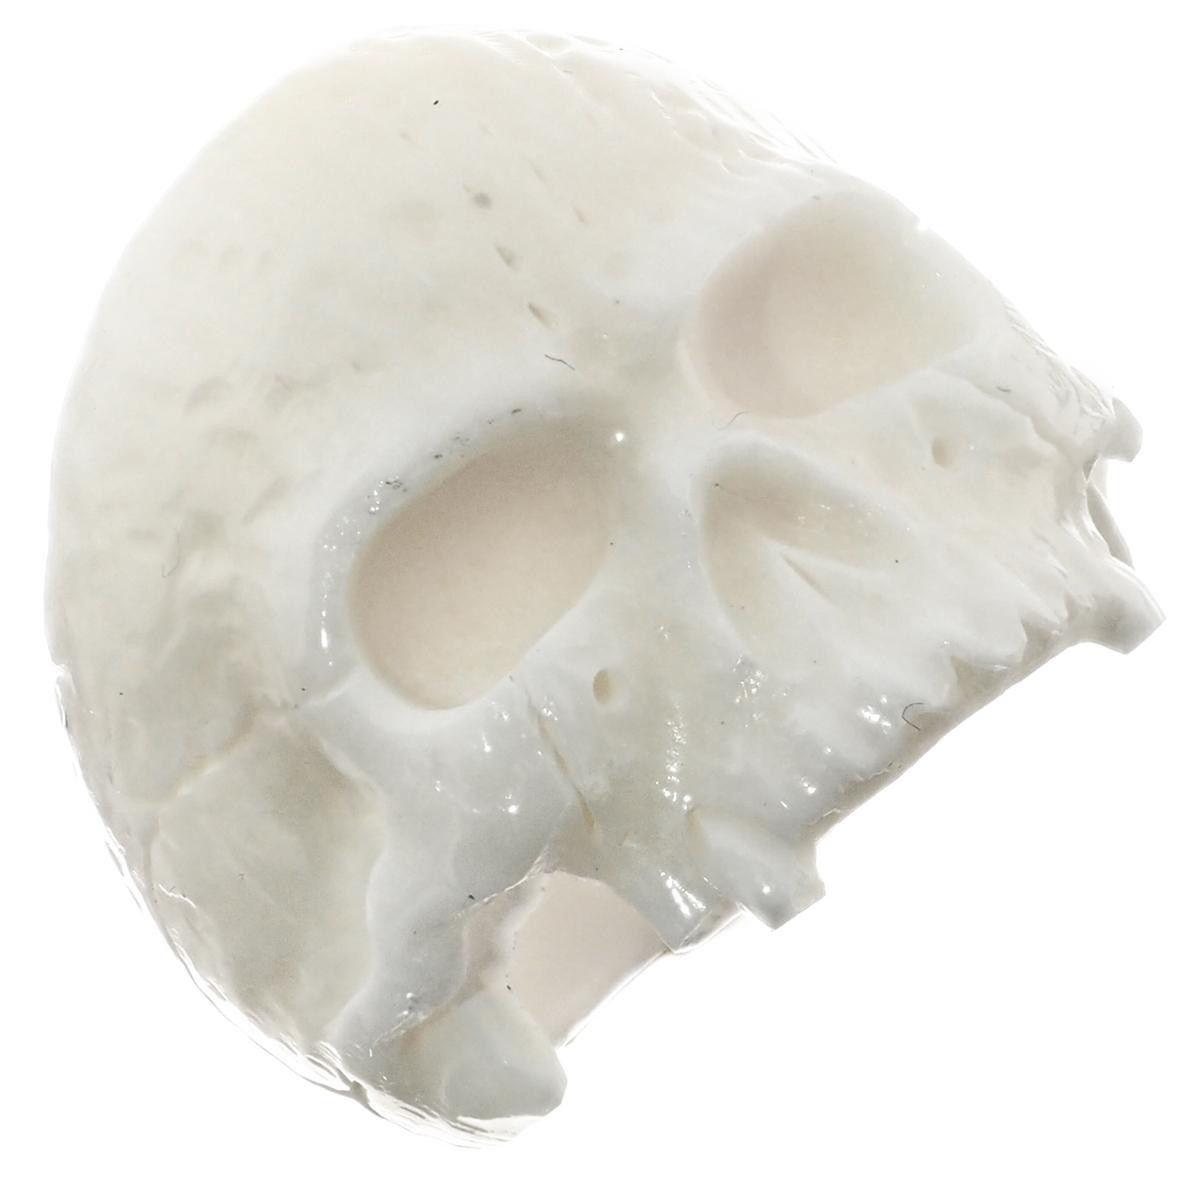 1 Large Mens Jawless Skull Bison Bone Hand Carving Ring S6580 Fifirose